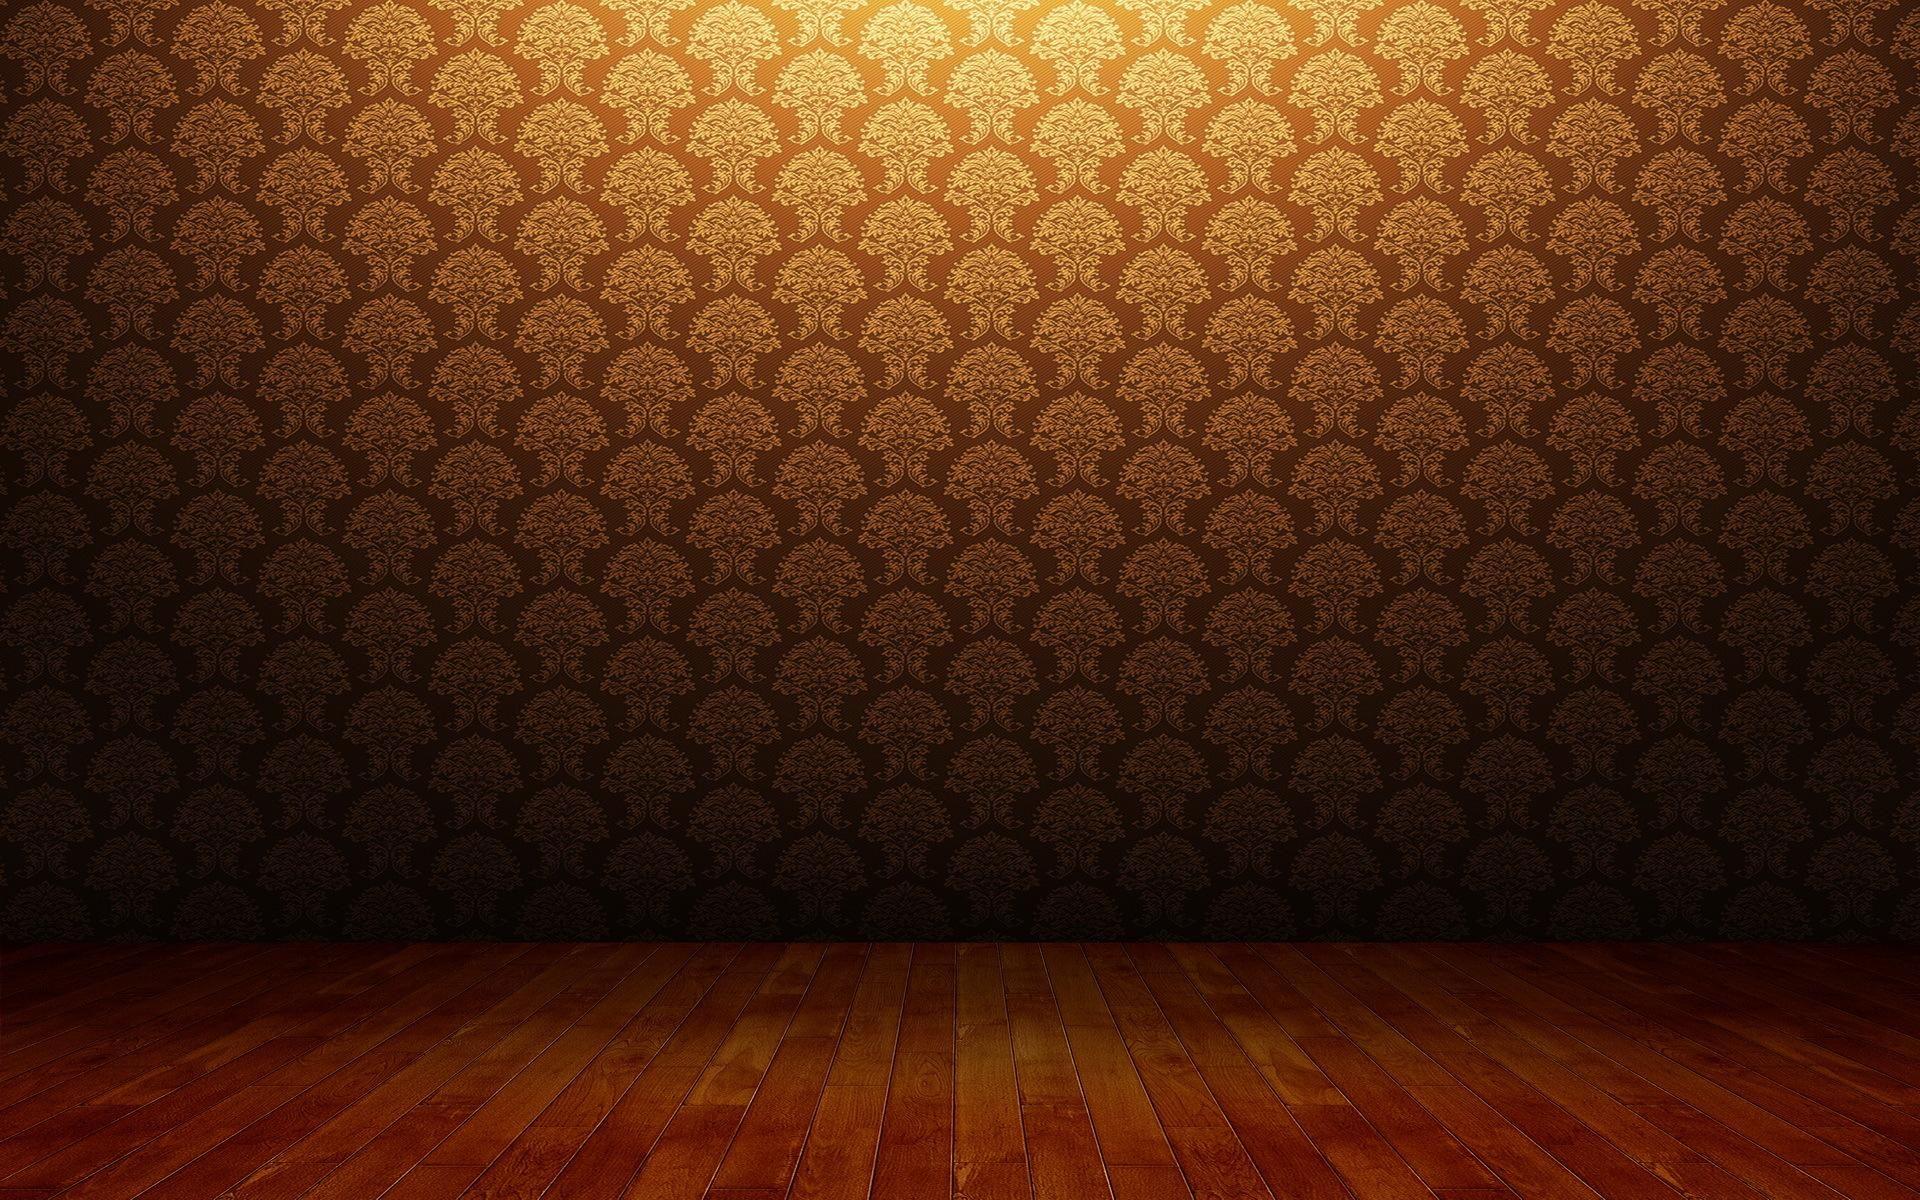 Reiner Braun HD Wallpapers Background Images Wallpaper